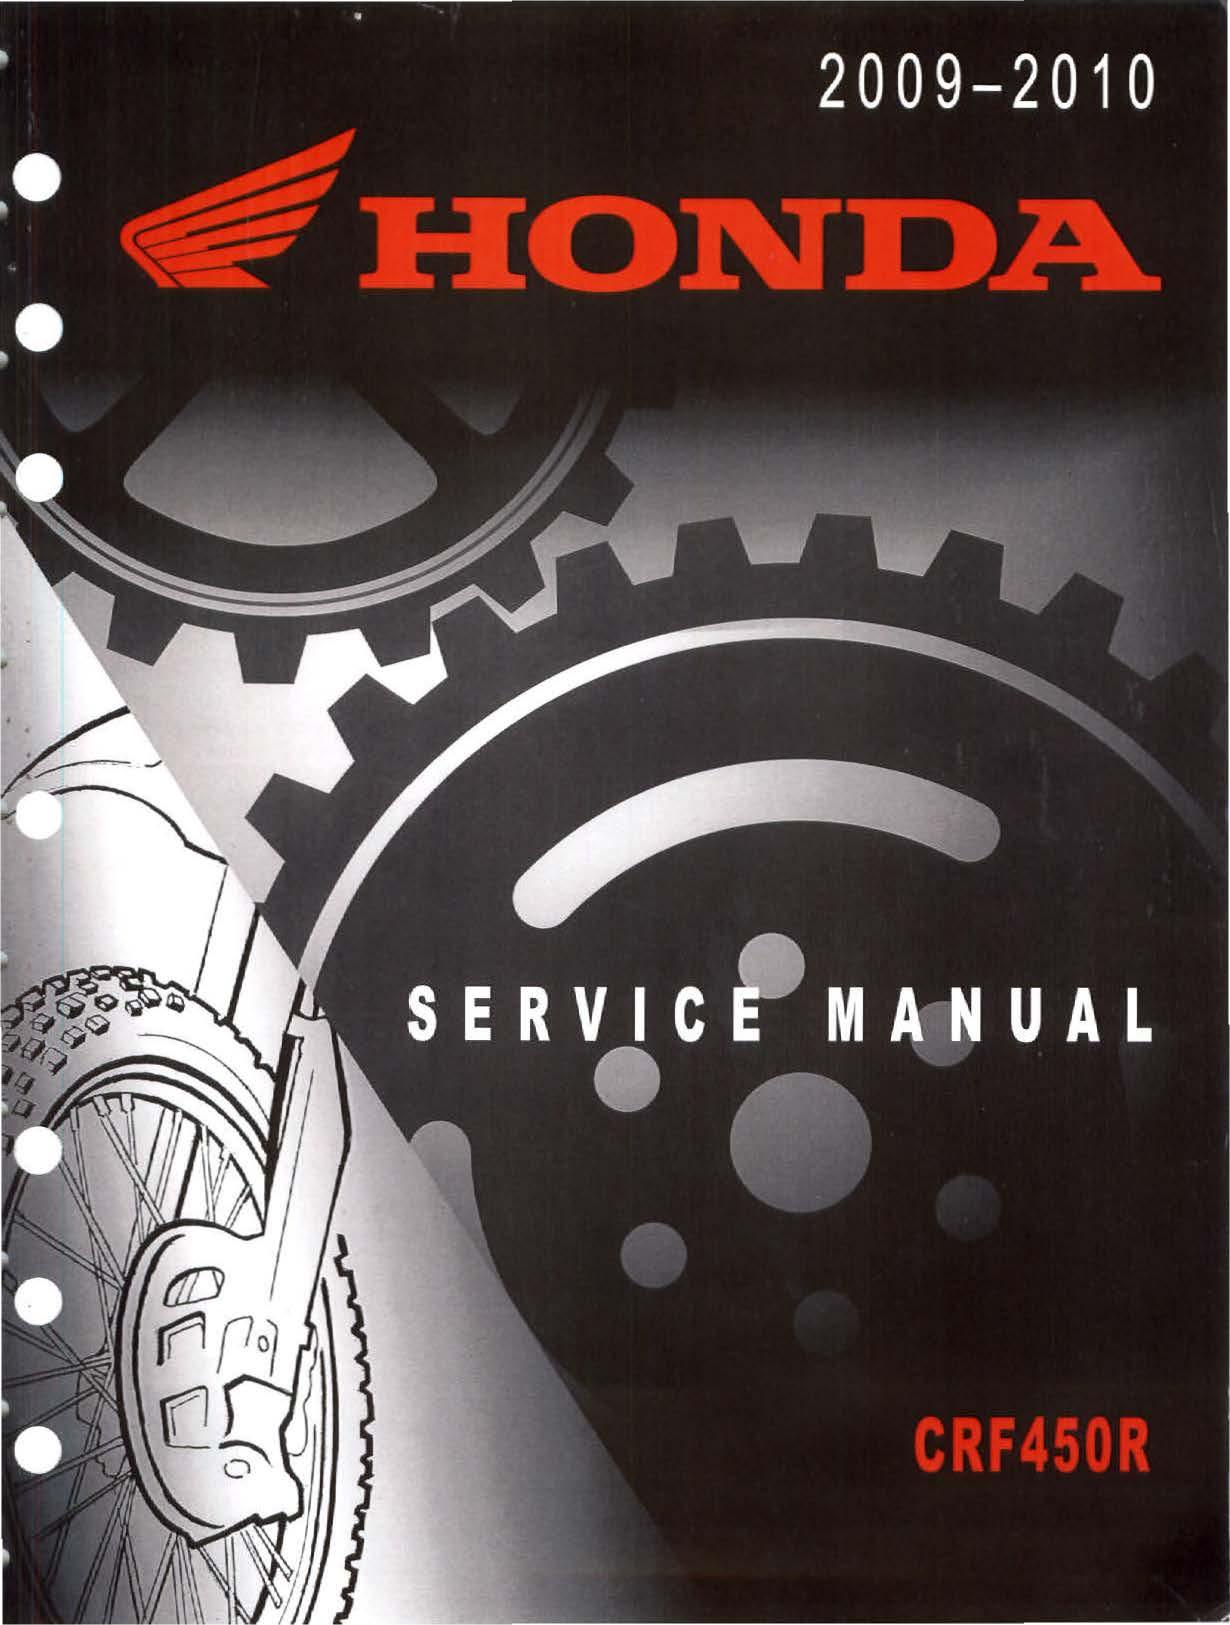 Workshop manual for Honda CRF450R (2009-2010)